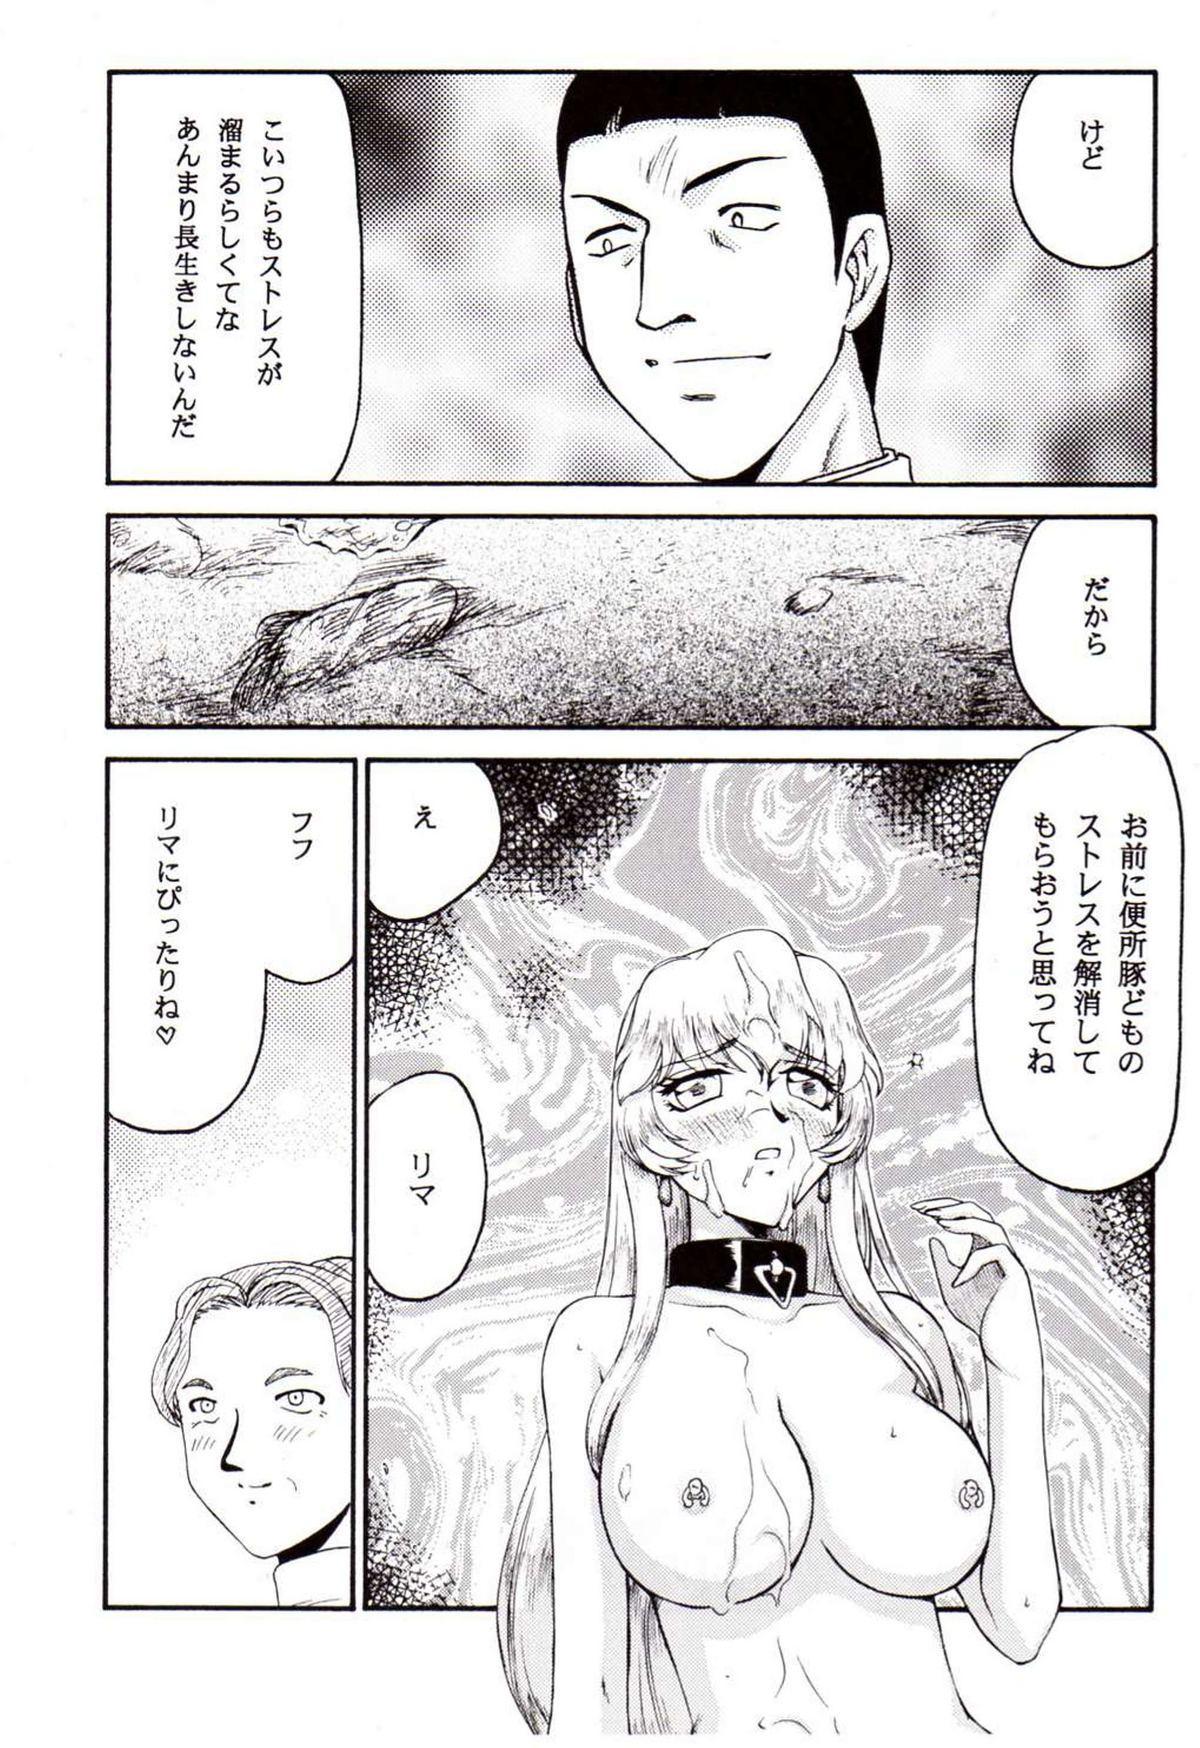 Nise Dragon Blood! 13 1/2 12